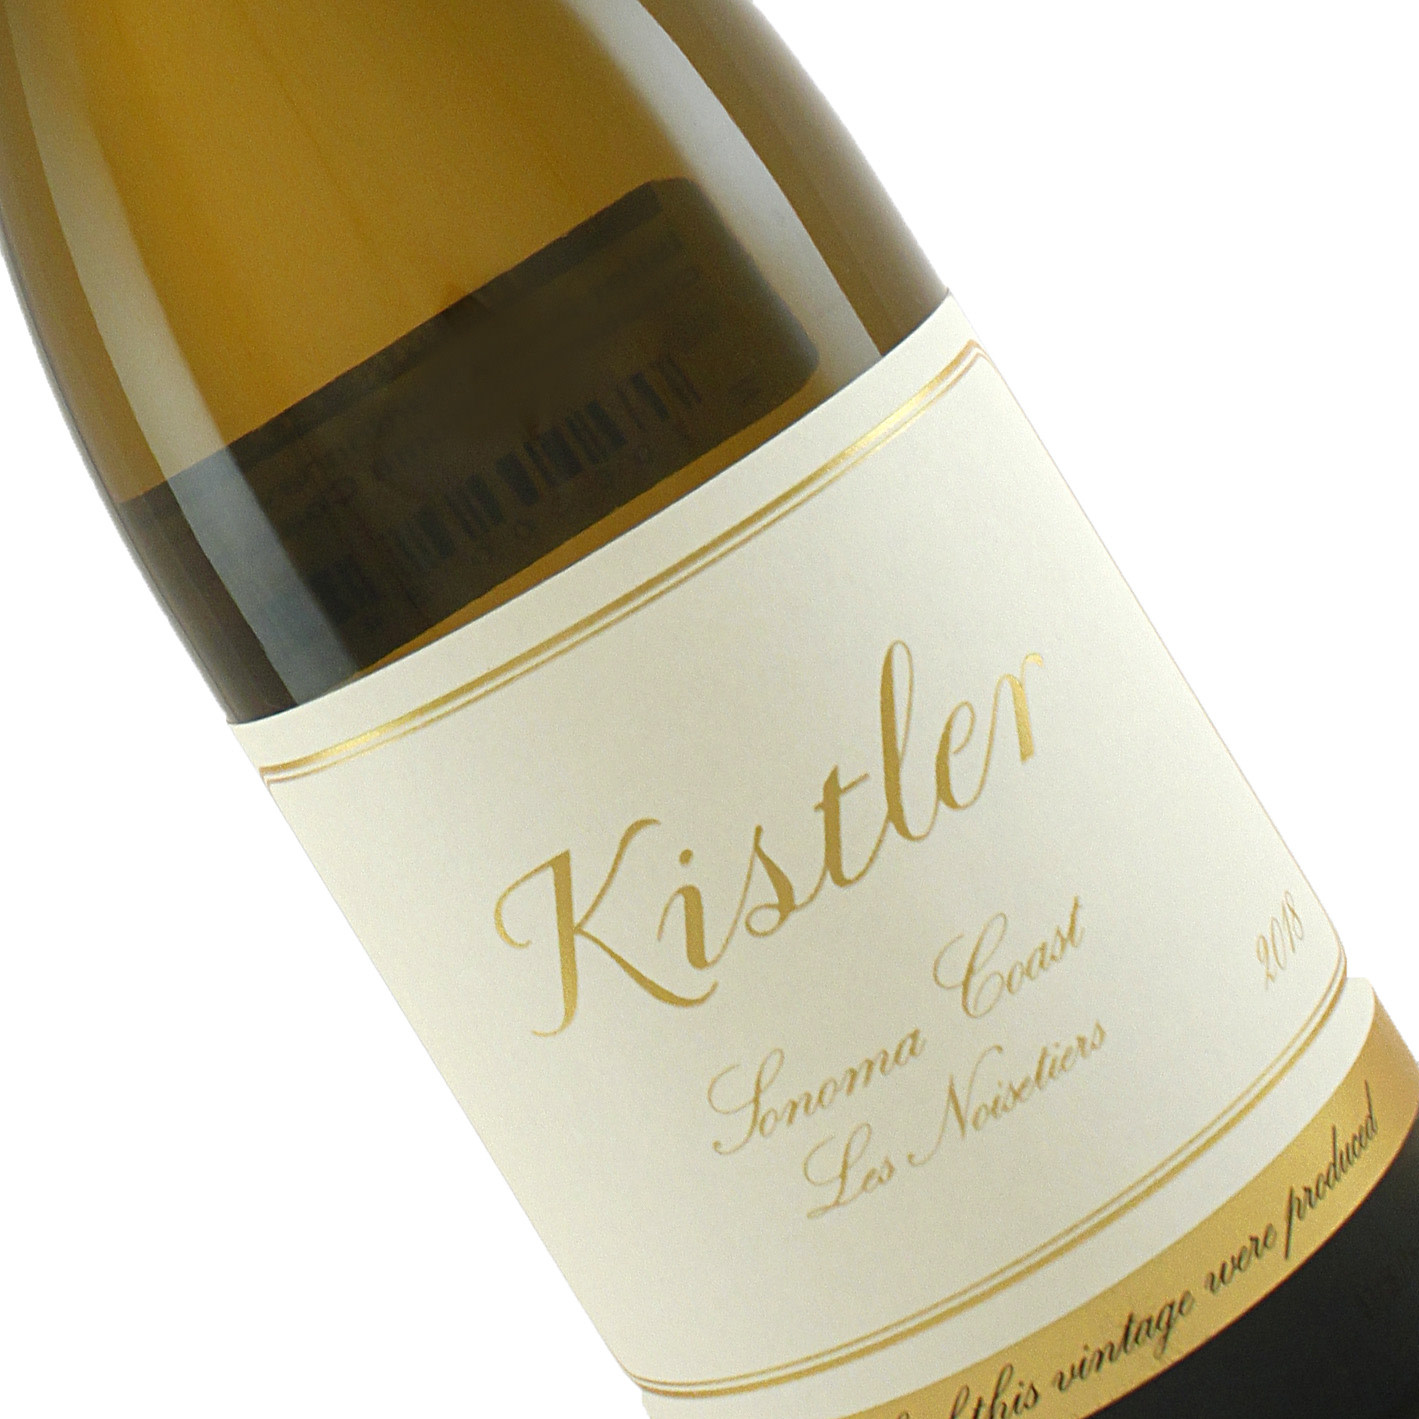 "Kistler 2019 Chardonnay ""Les Noisetiers"" Sonoma Coast"